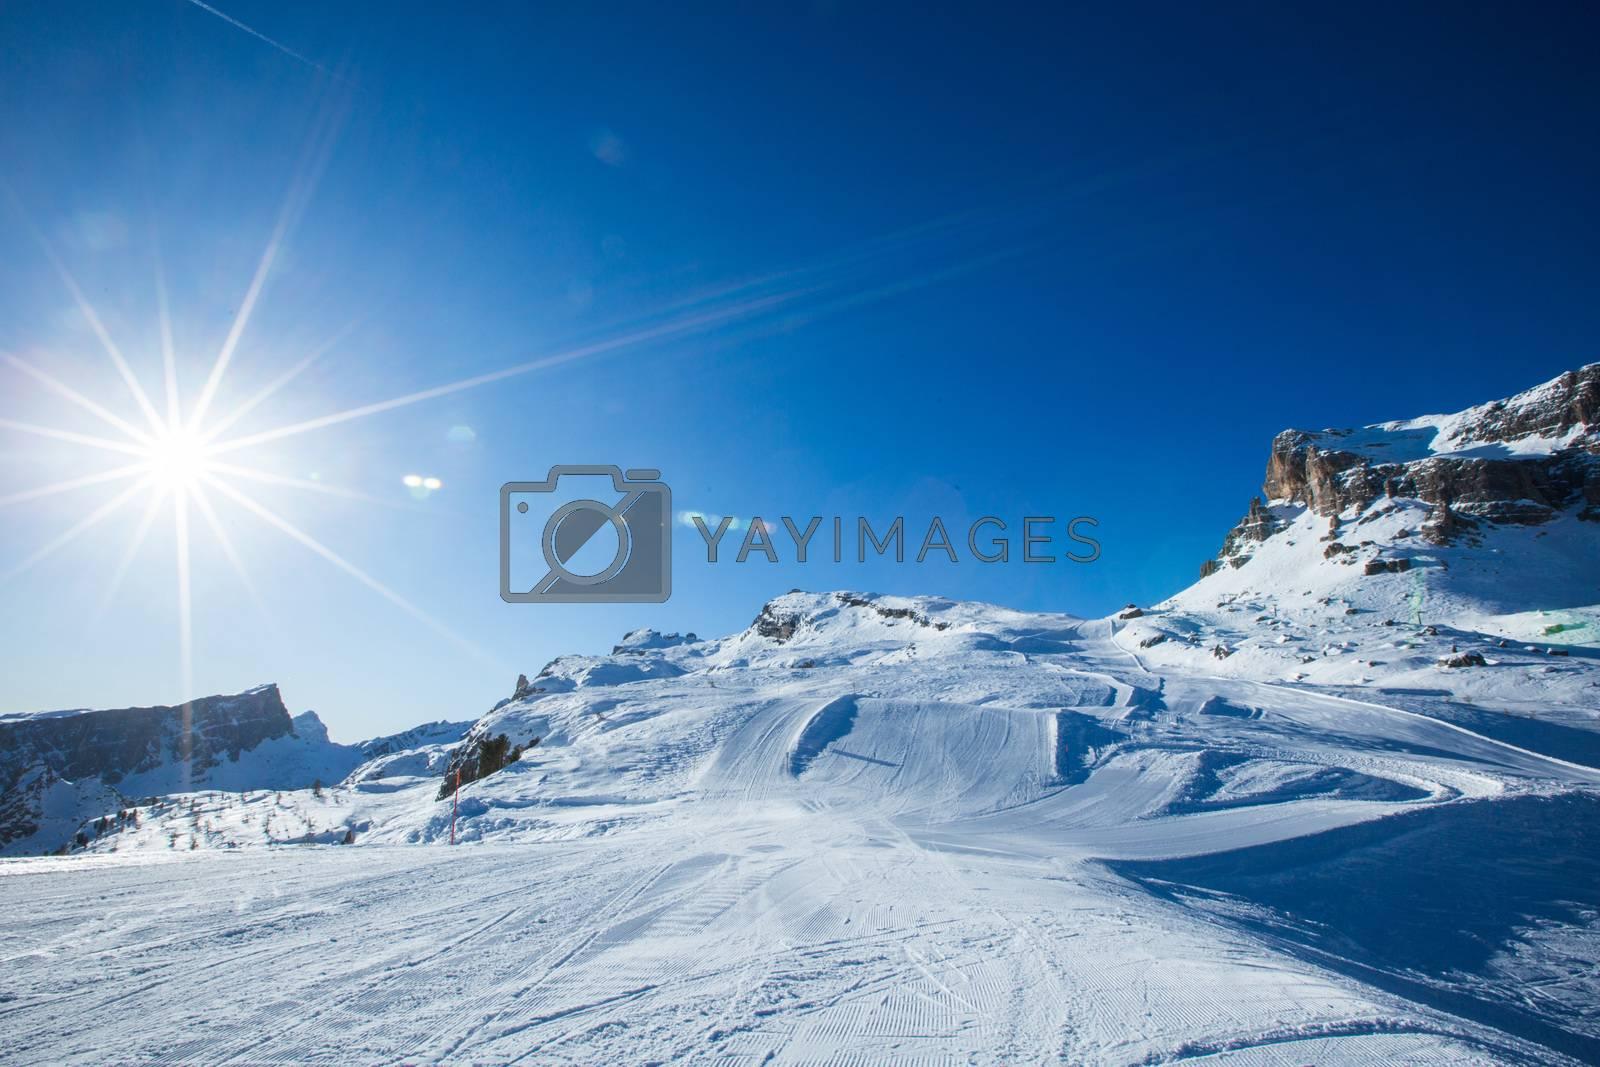 Dolomities Dolomiti Italy in wintertime beautiful alps winter mountains and ski slope Cortina d'Ampezzo Cinque torri mountain peaks famous landscape skiing resort area